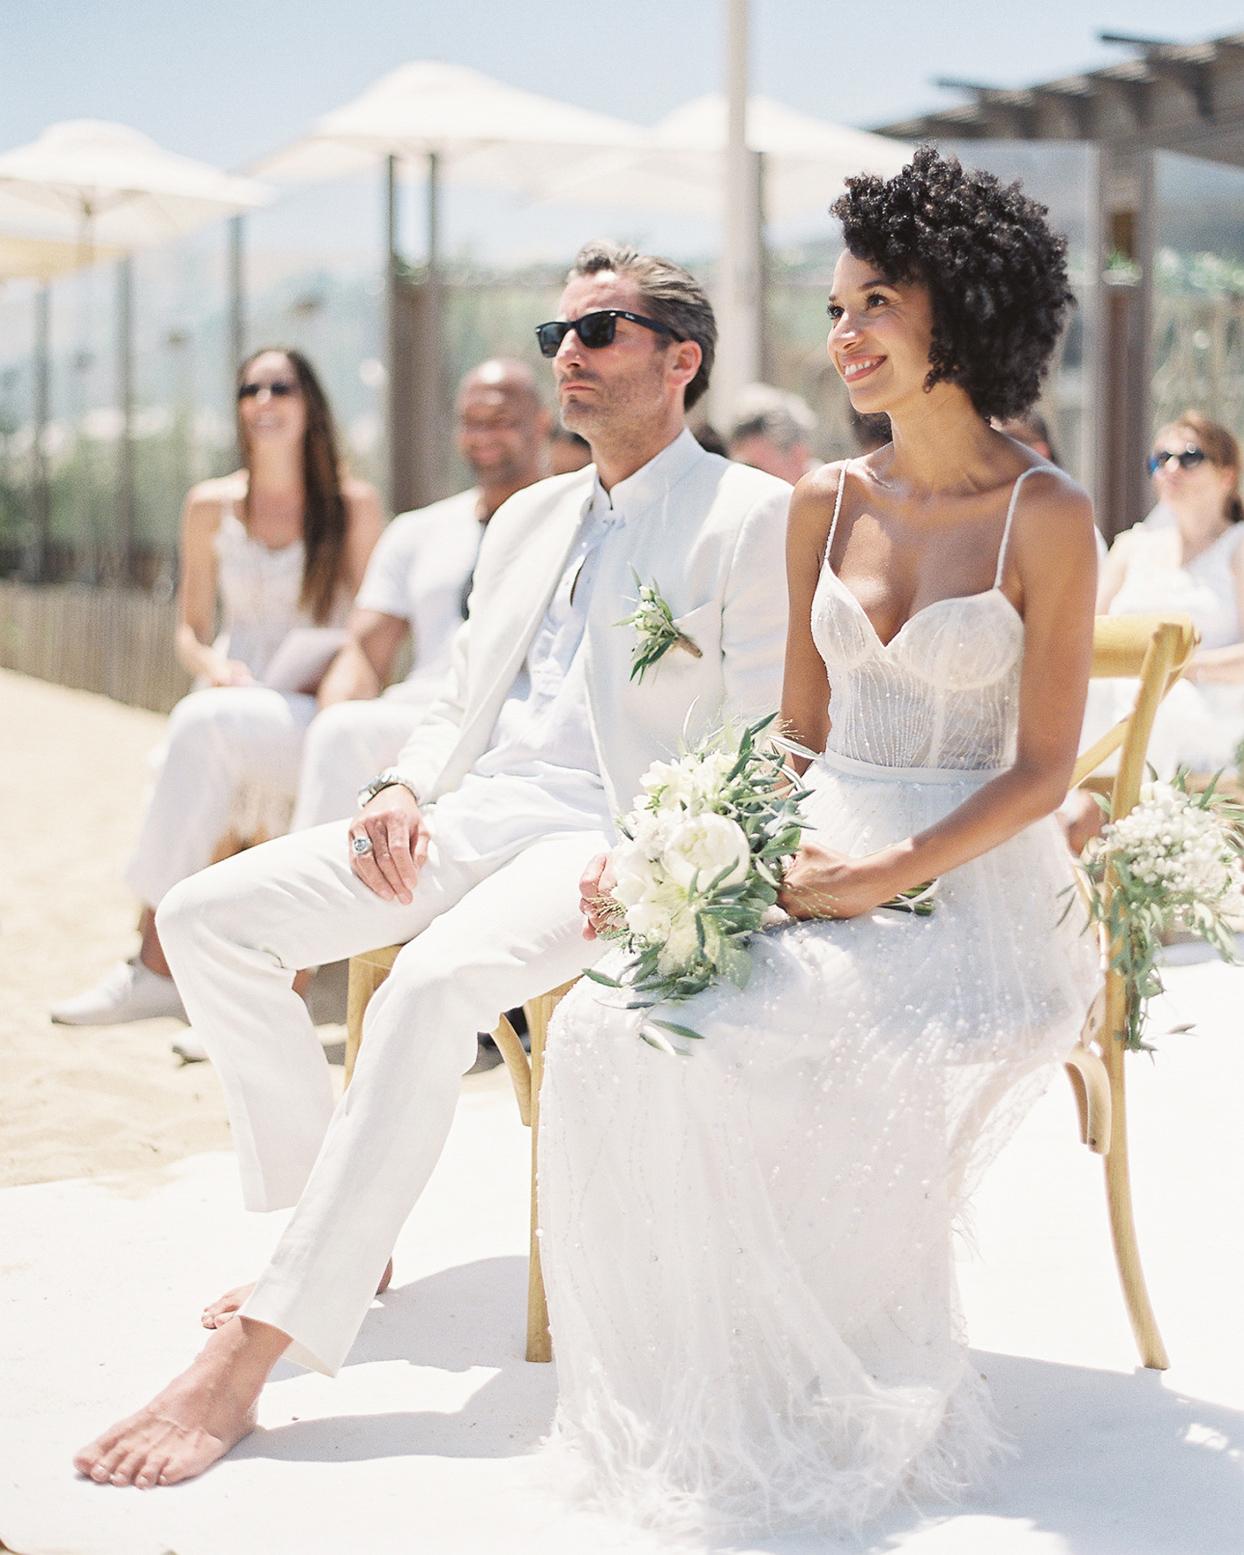 patricia ralph wedding ceremony vows